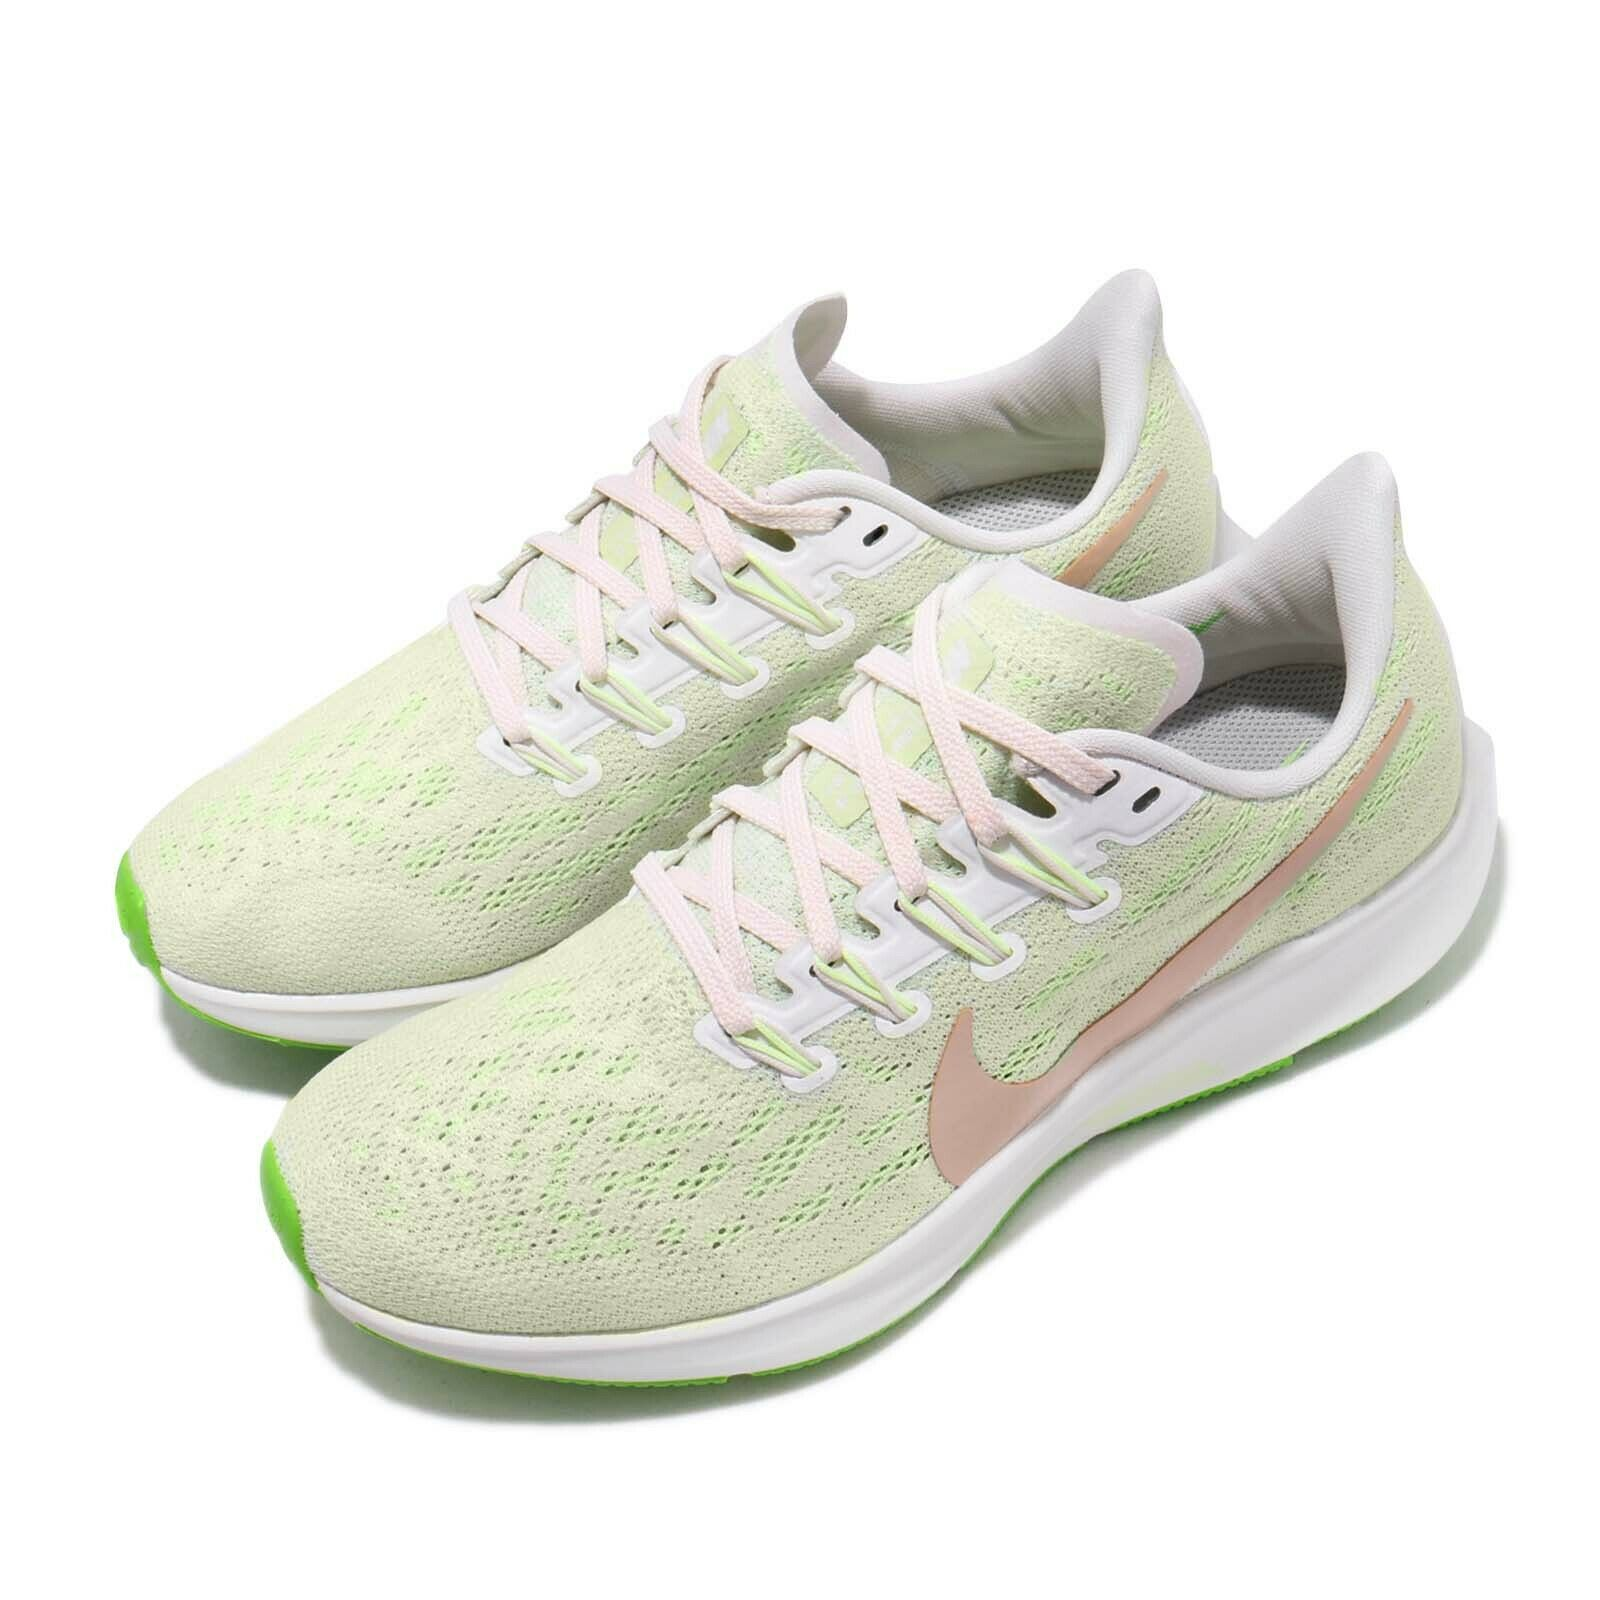 Nike Wmns Air Zoom Pegasus 36 Beige Barly Volt daSie Laufen schuhe AQ2210-002